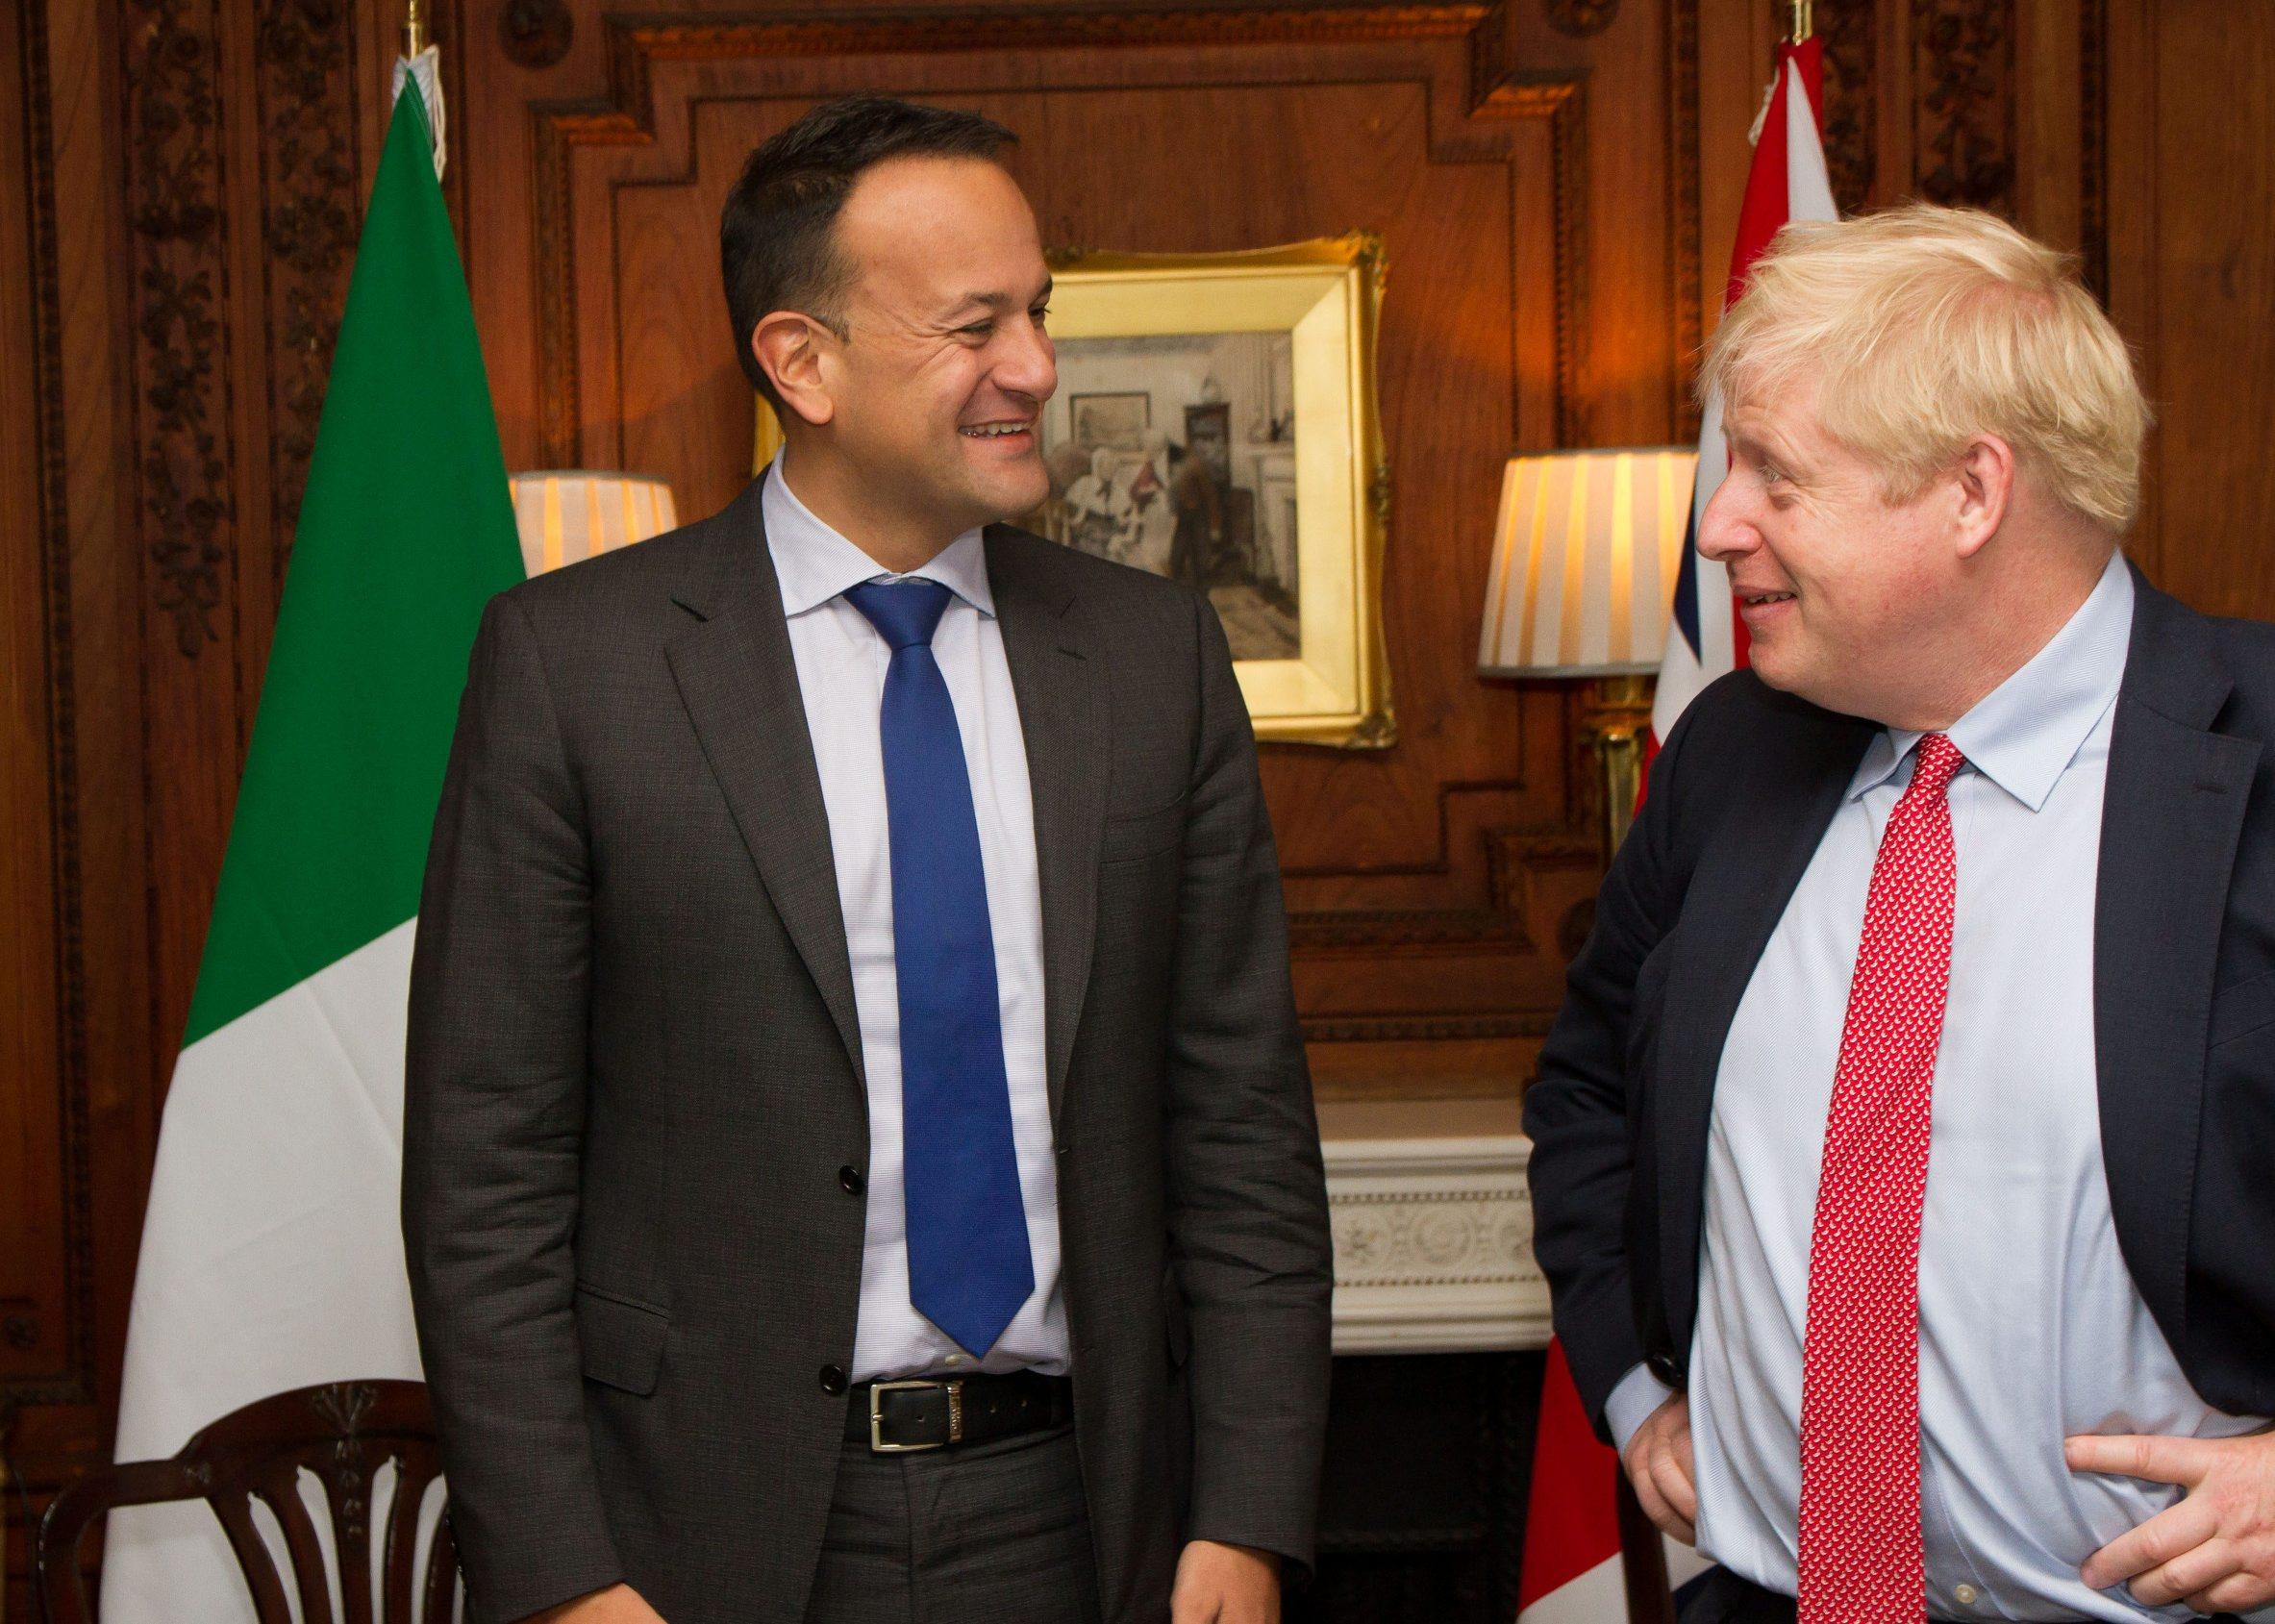 Irski premijer Leo Varadkar i britanski kolega Boris Johnson na nedavnom tajnom sastanku u Engleskoj